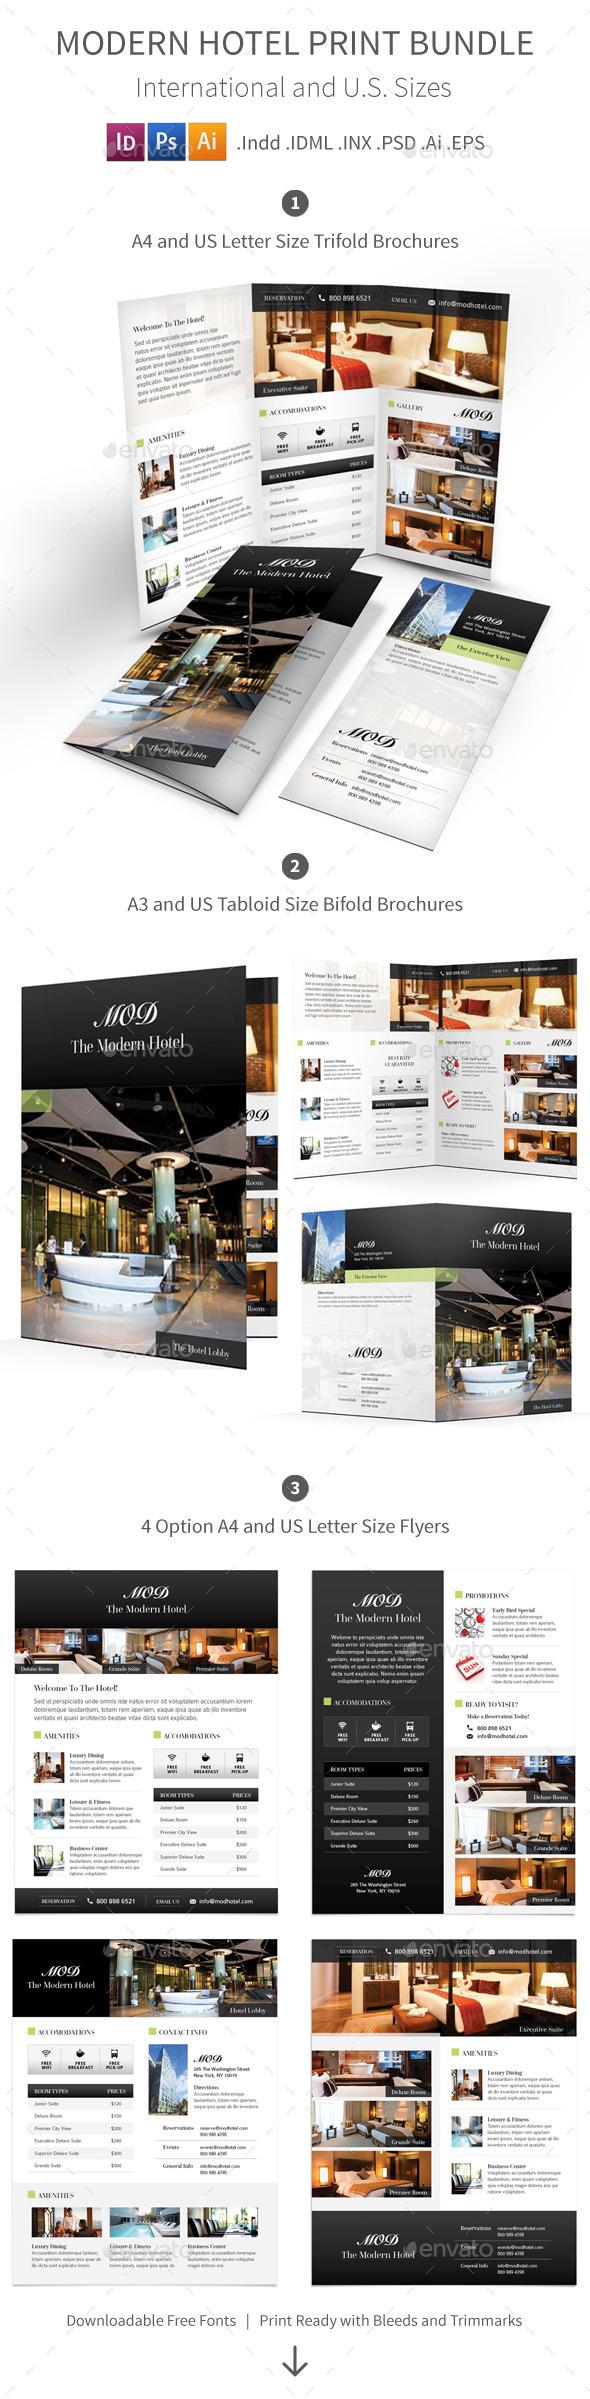 Modern Hotel Print Bundle - Informational Brochures